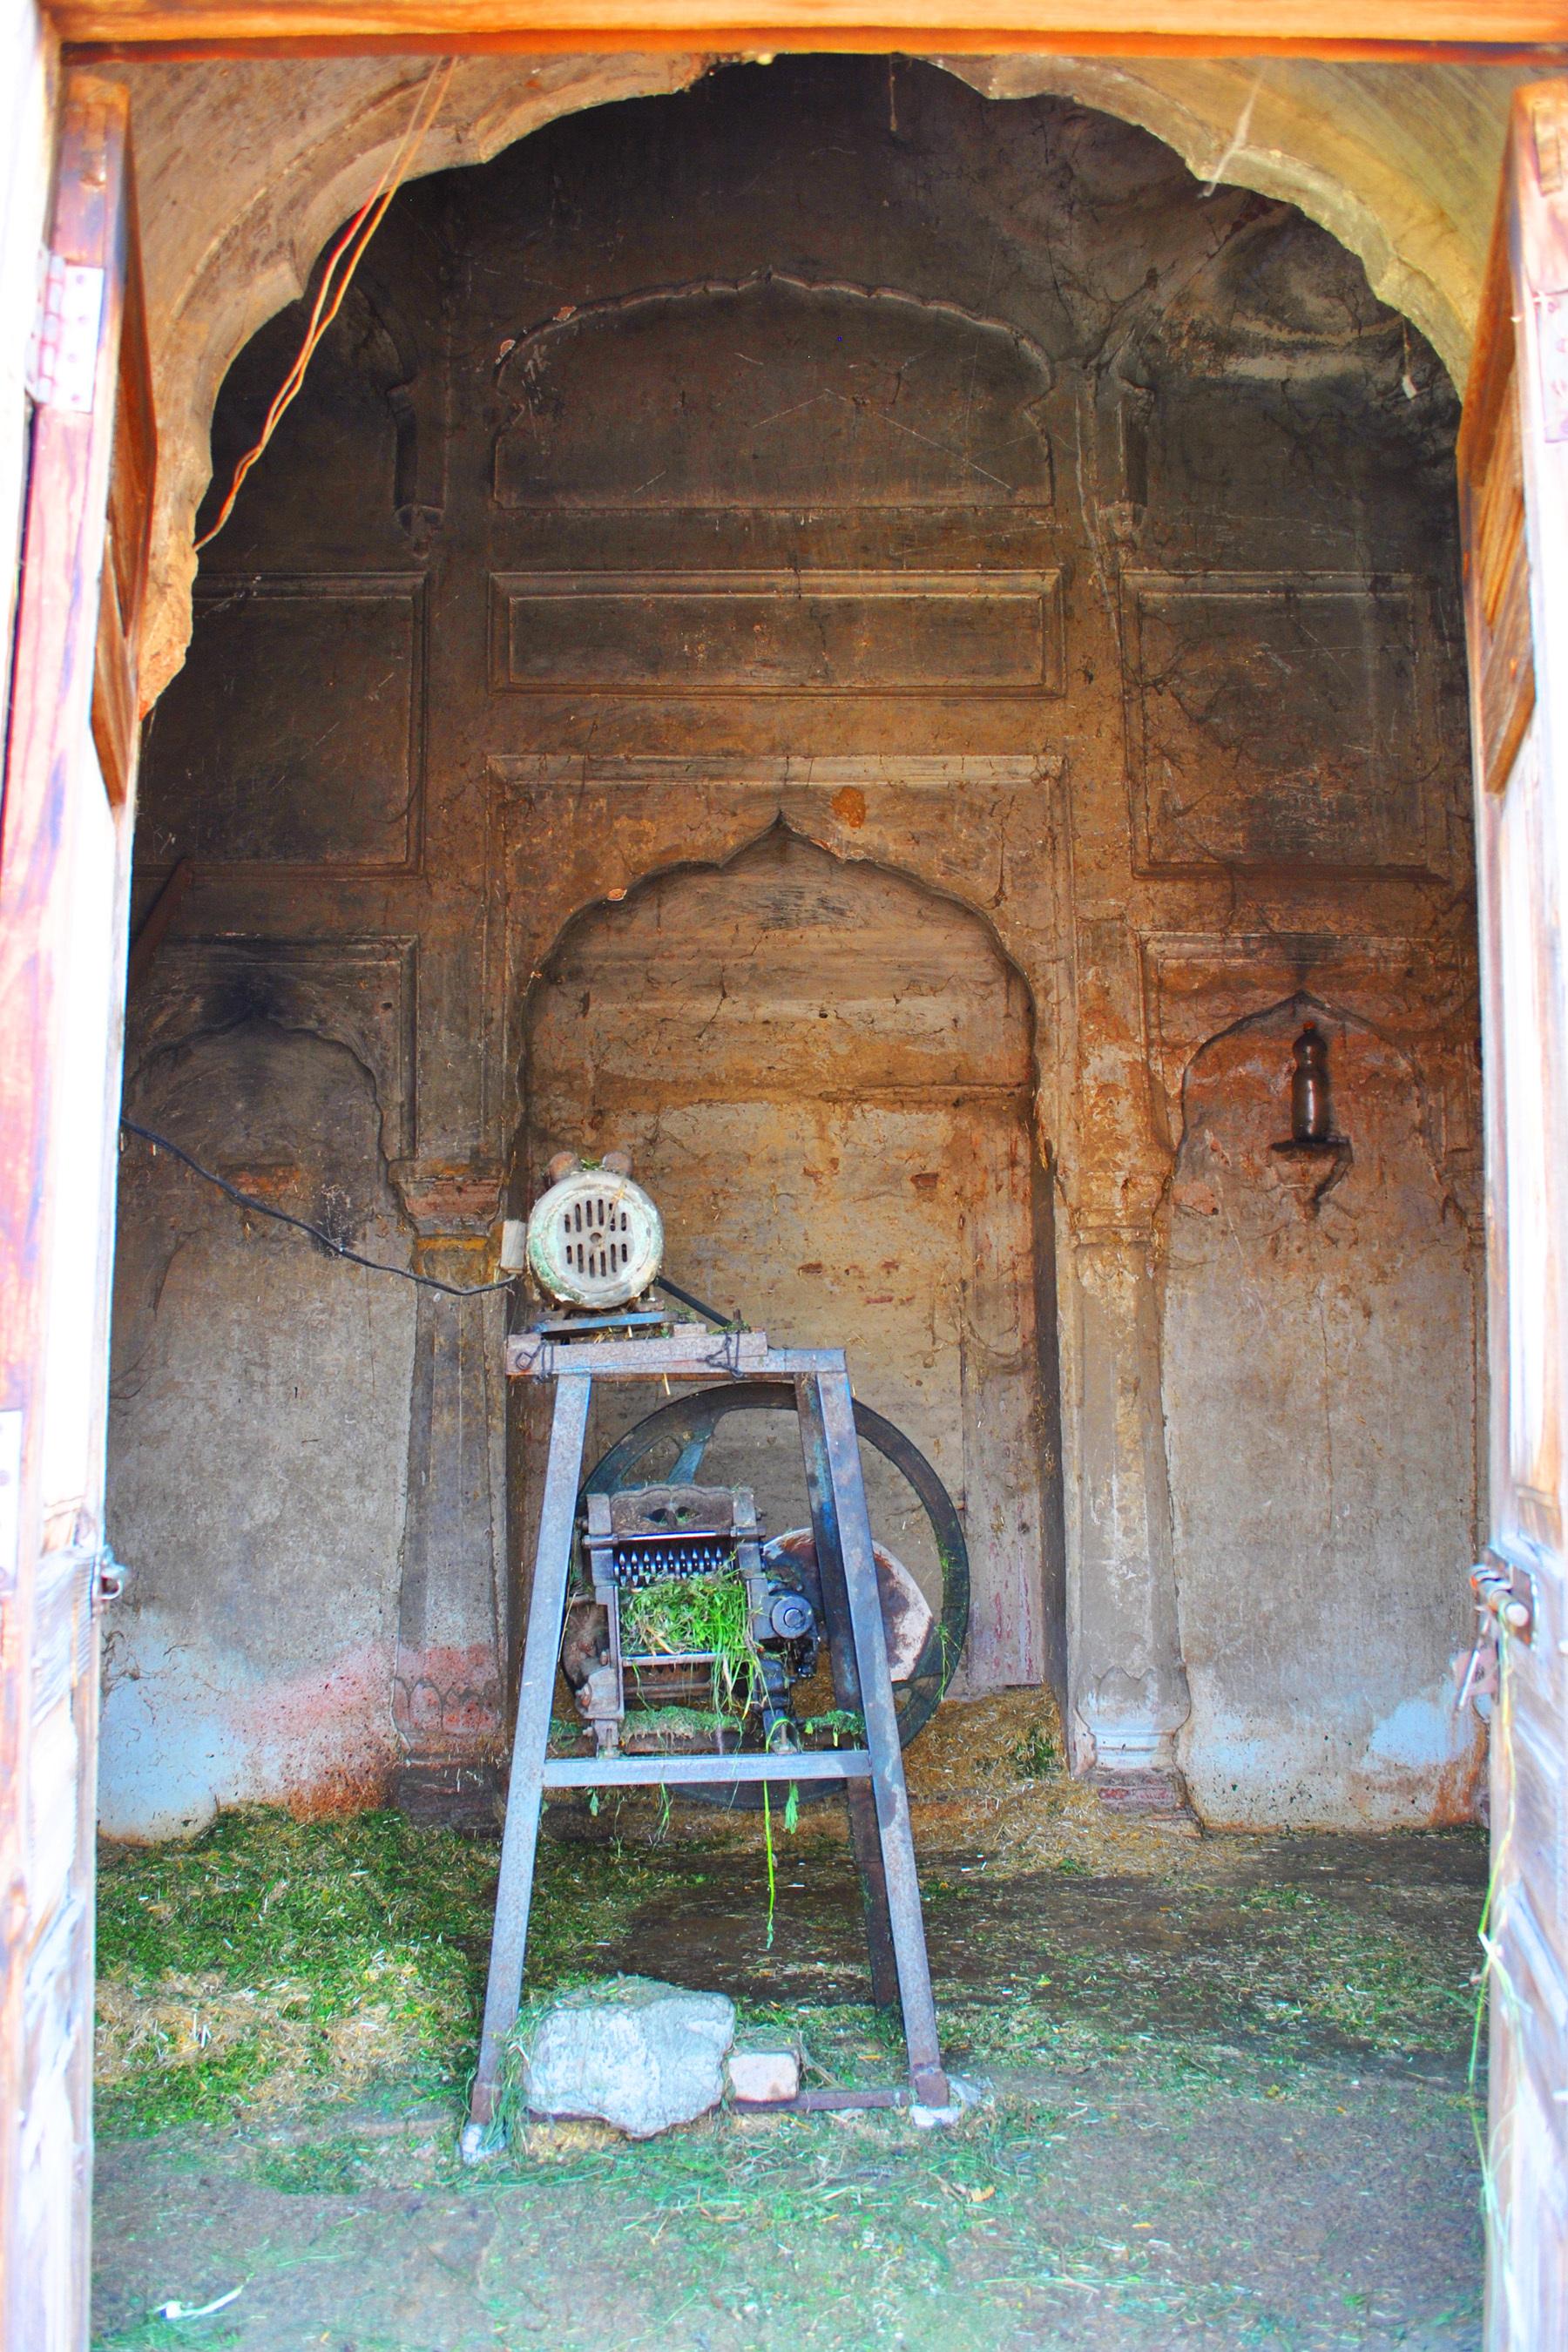 Fodder-cutting machine installed inside a temple.